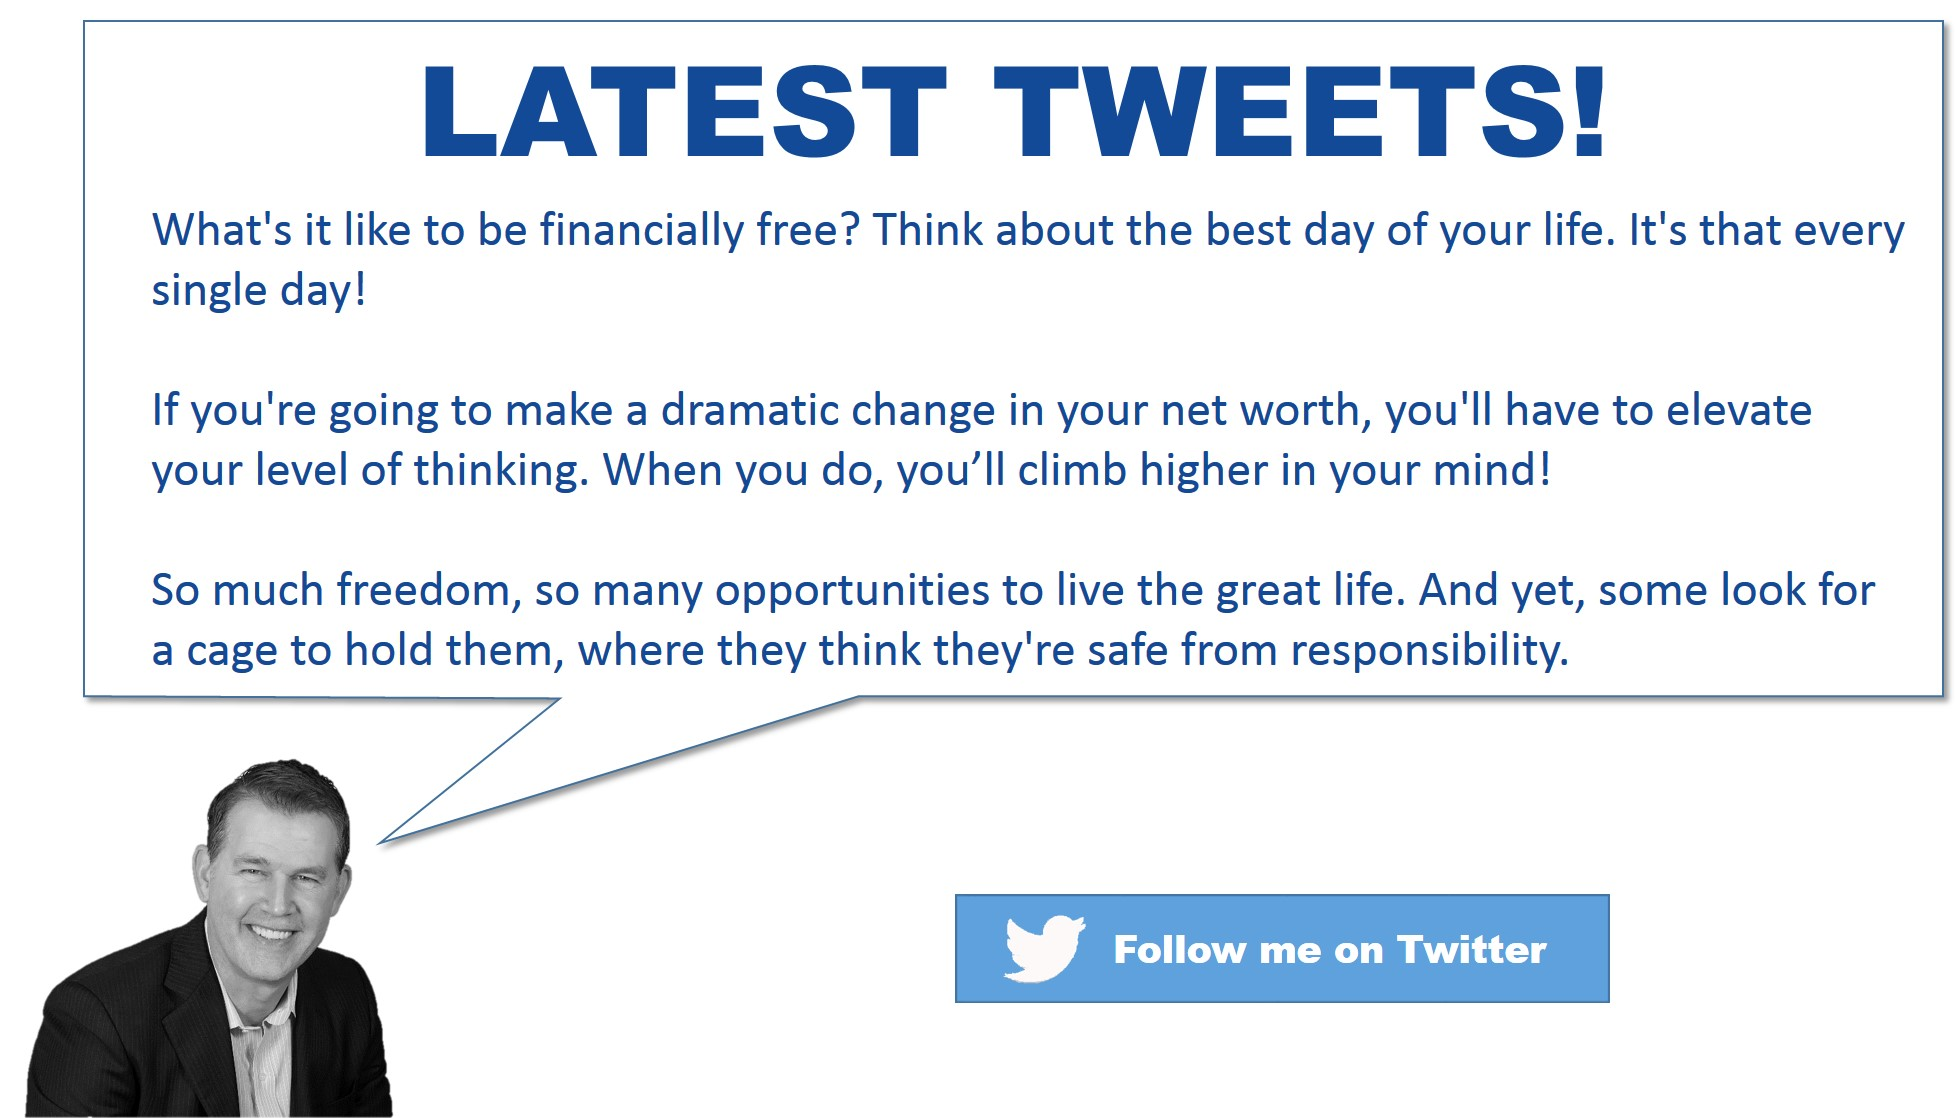 MontyCampbell-Tweets-12-22-17